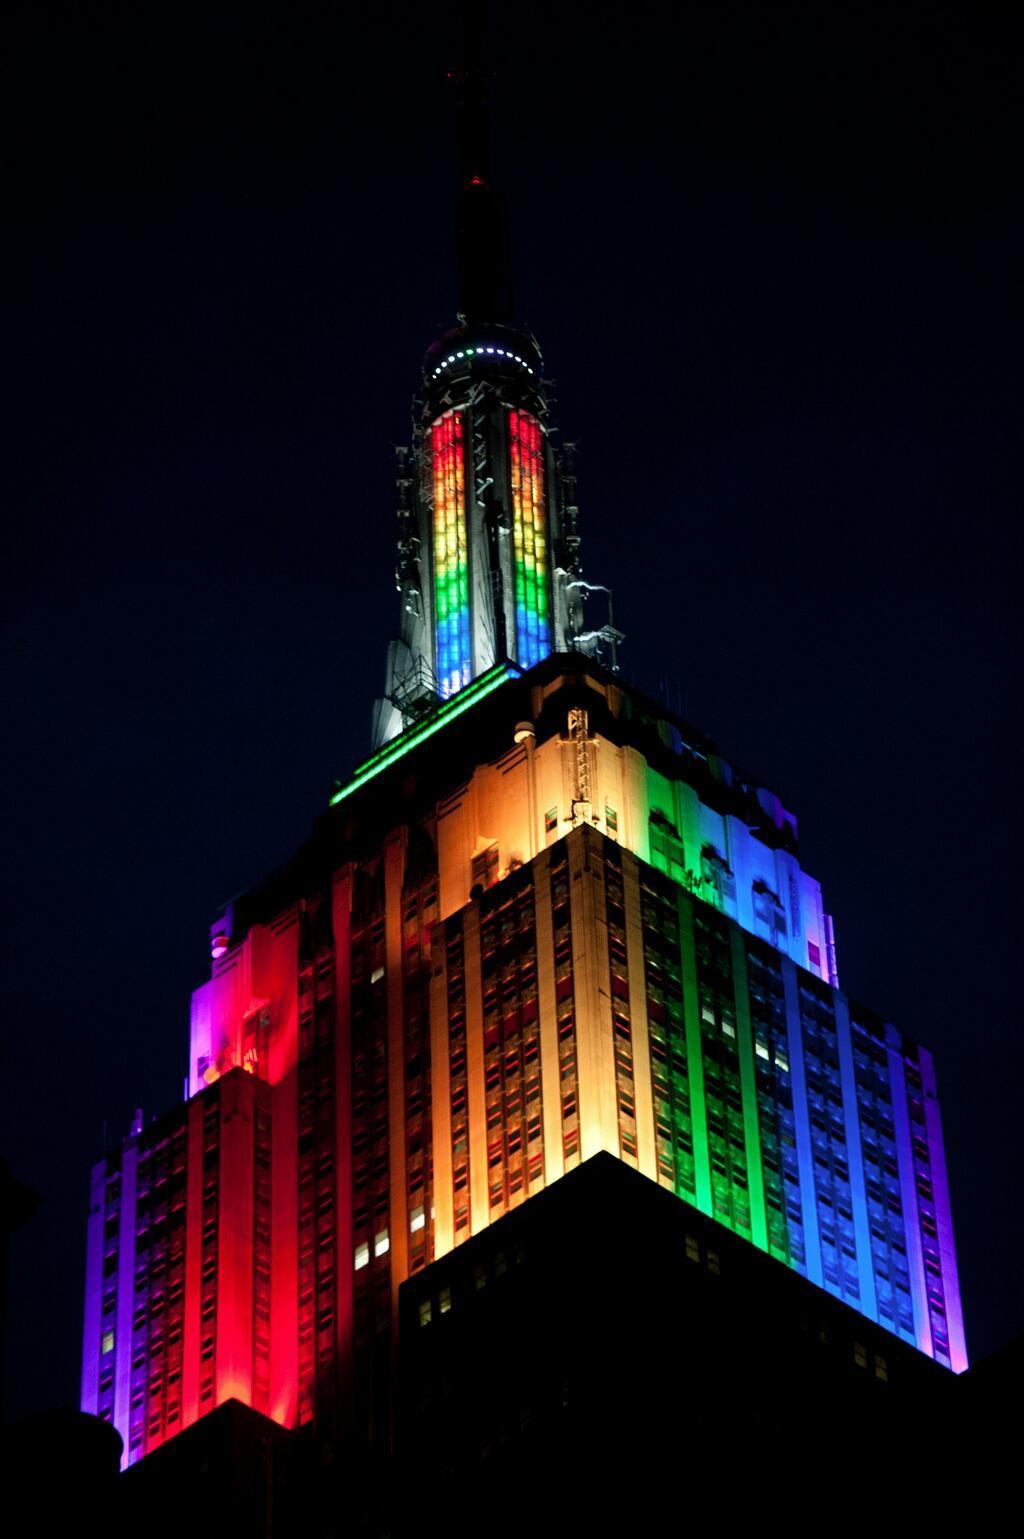 empire state buildling rainbow